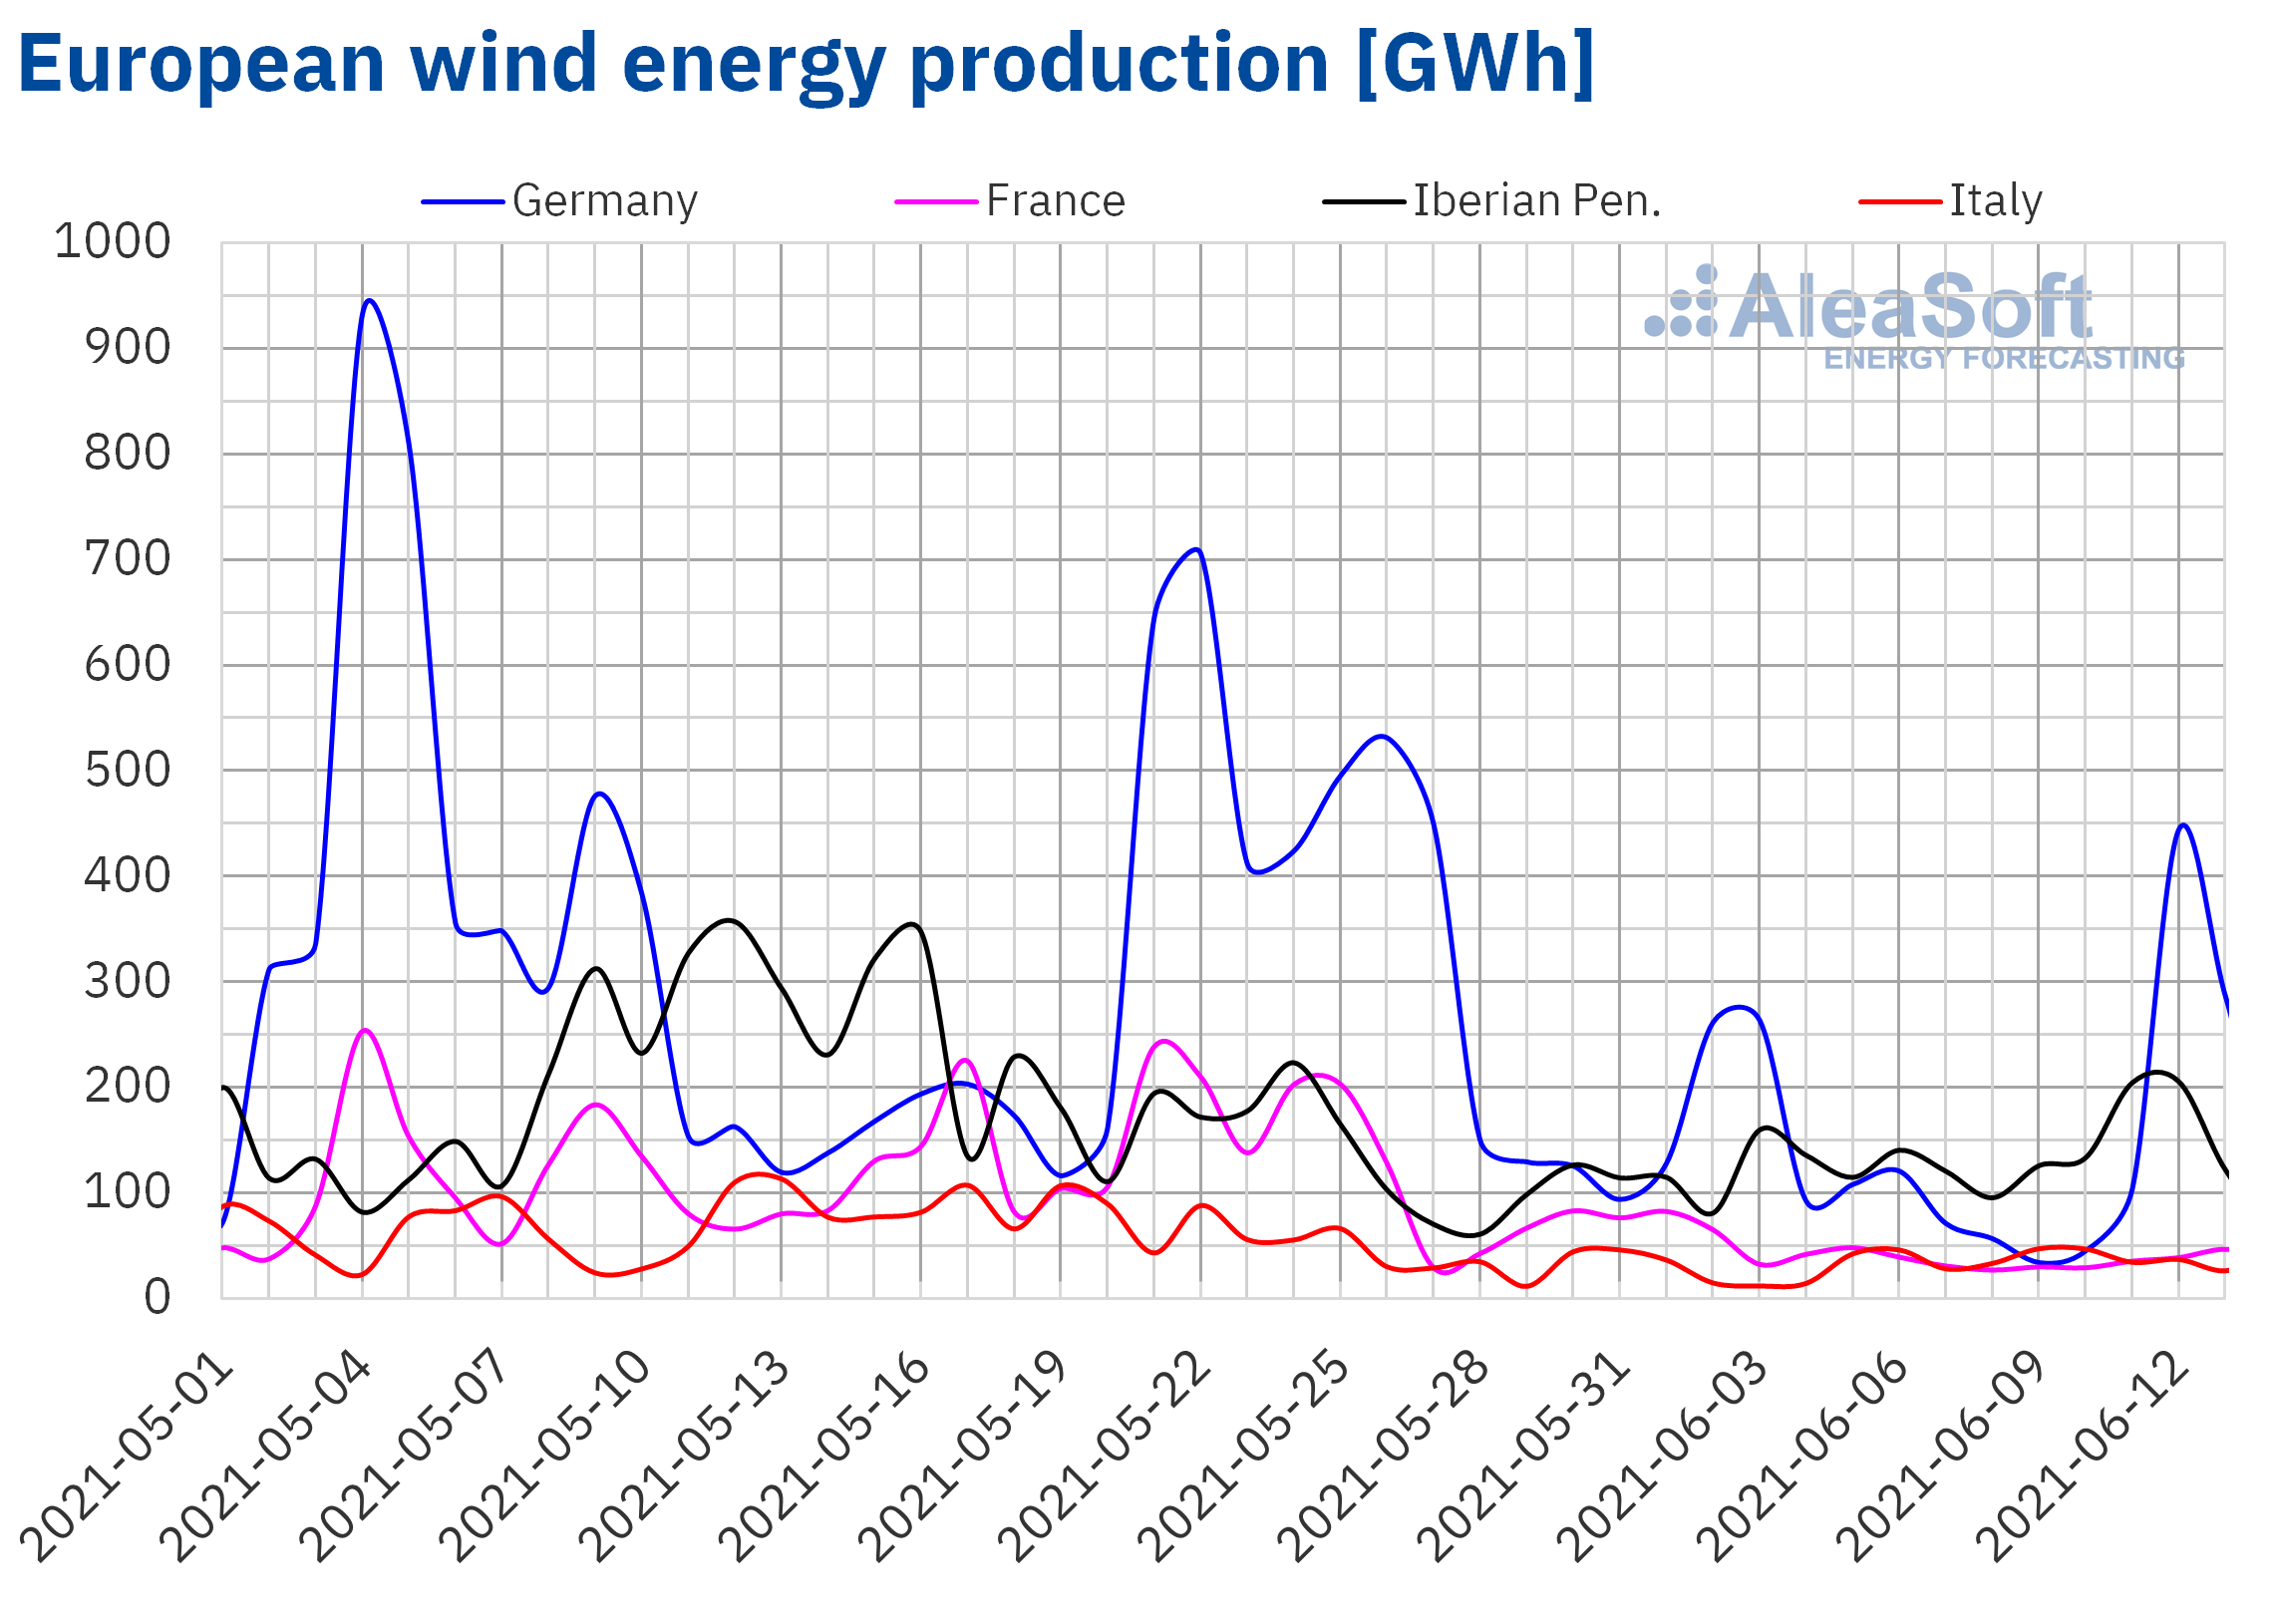 AleaSoft - Wind energy production electricity Europe